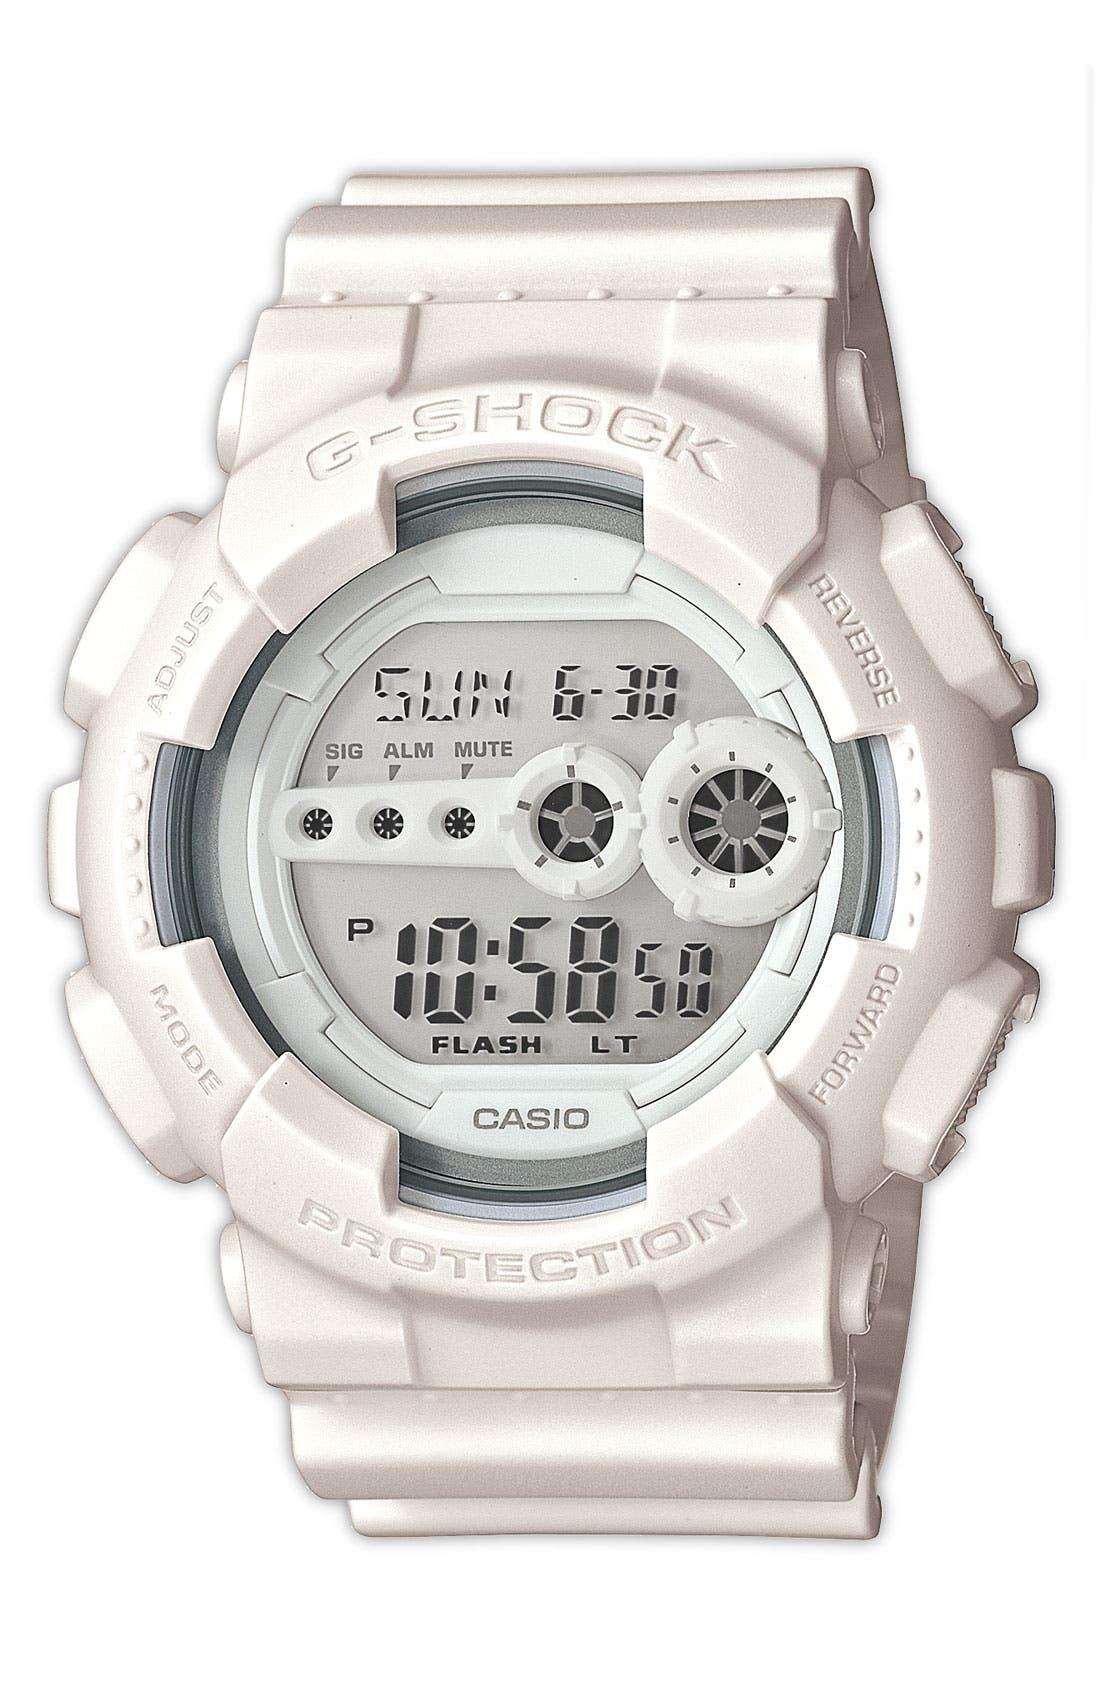 Main Image - G-Shock 'Super Luminosity' Digital Watch, 51mm